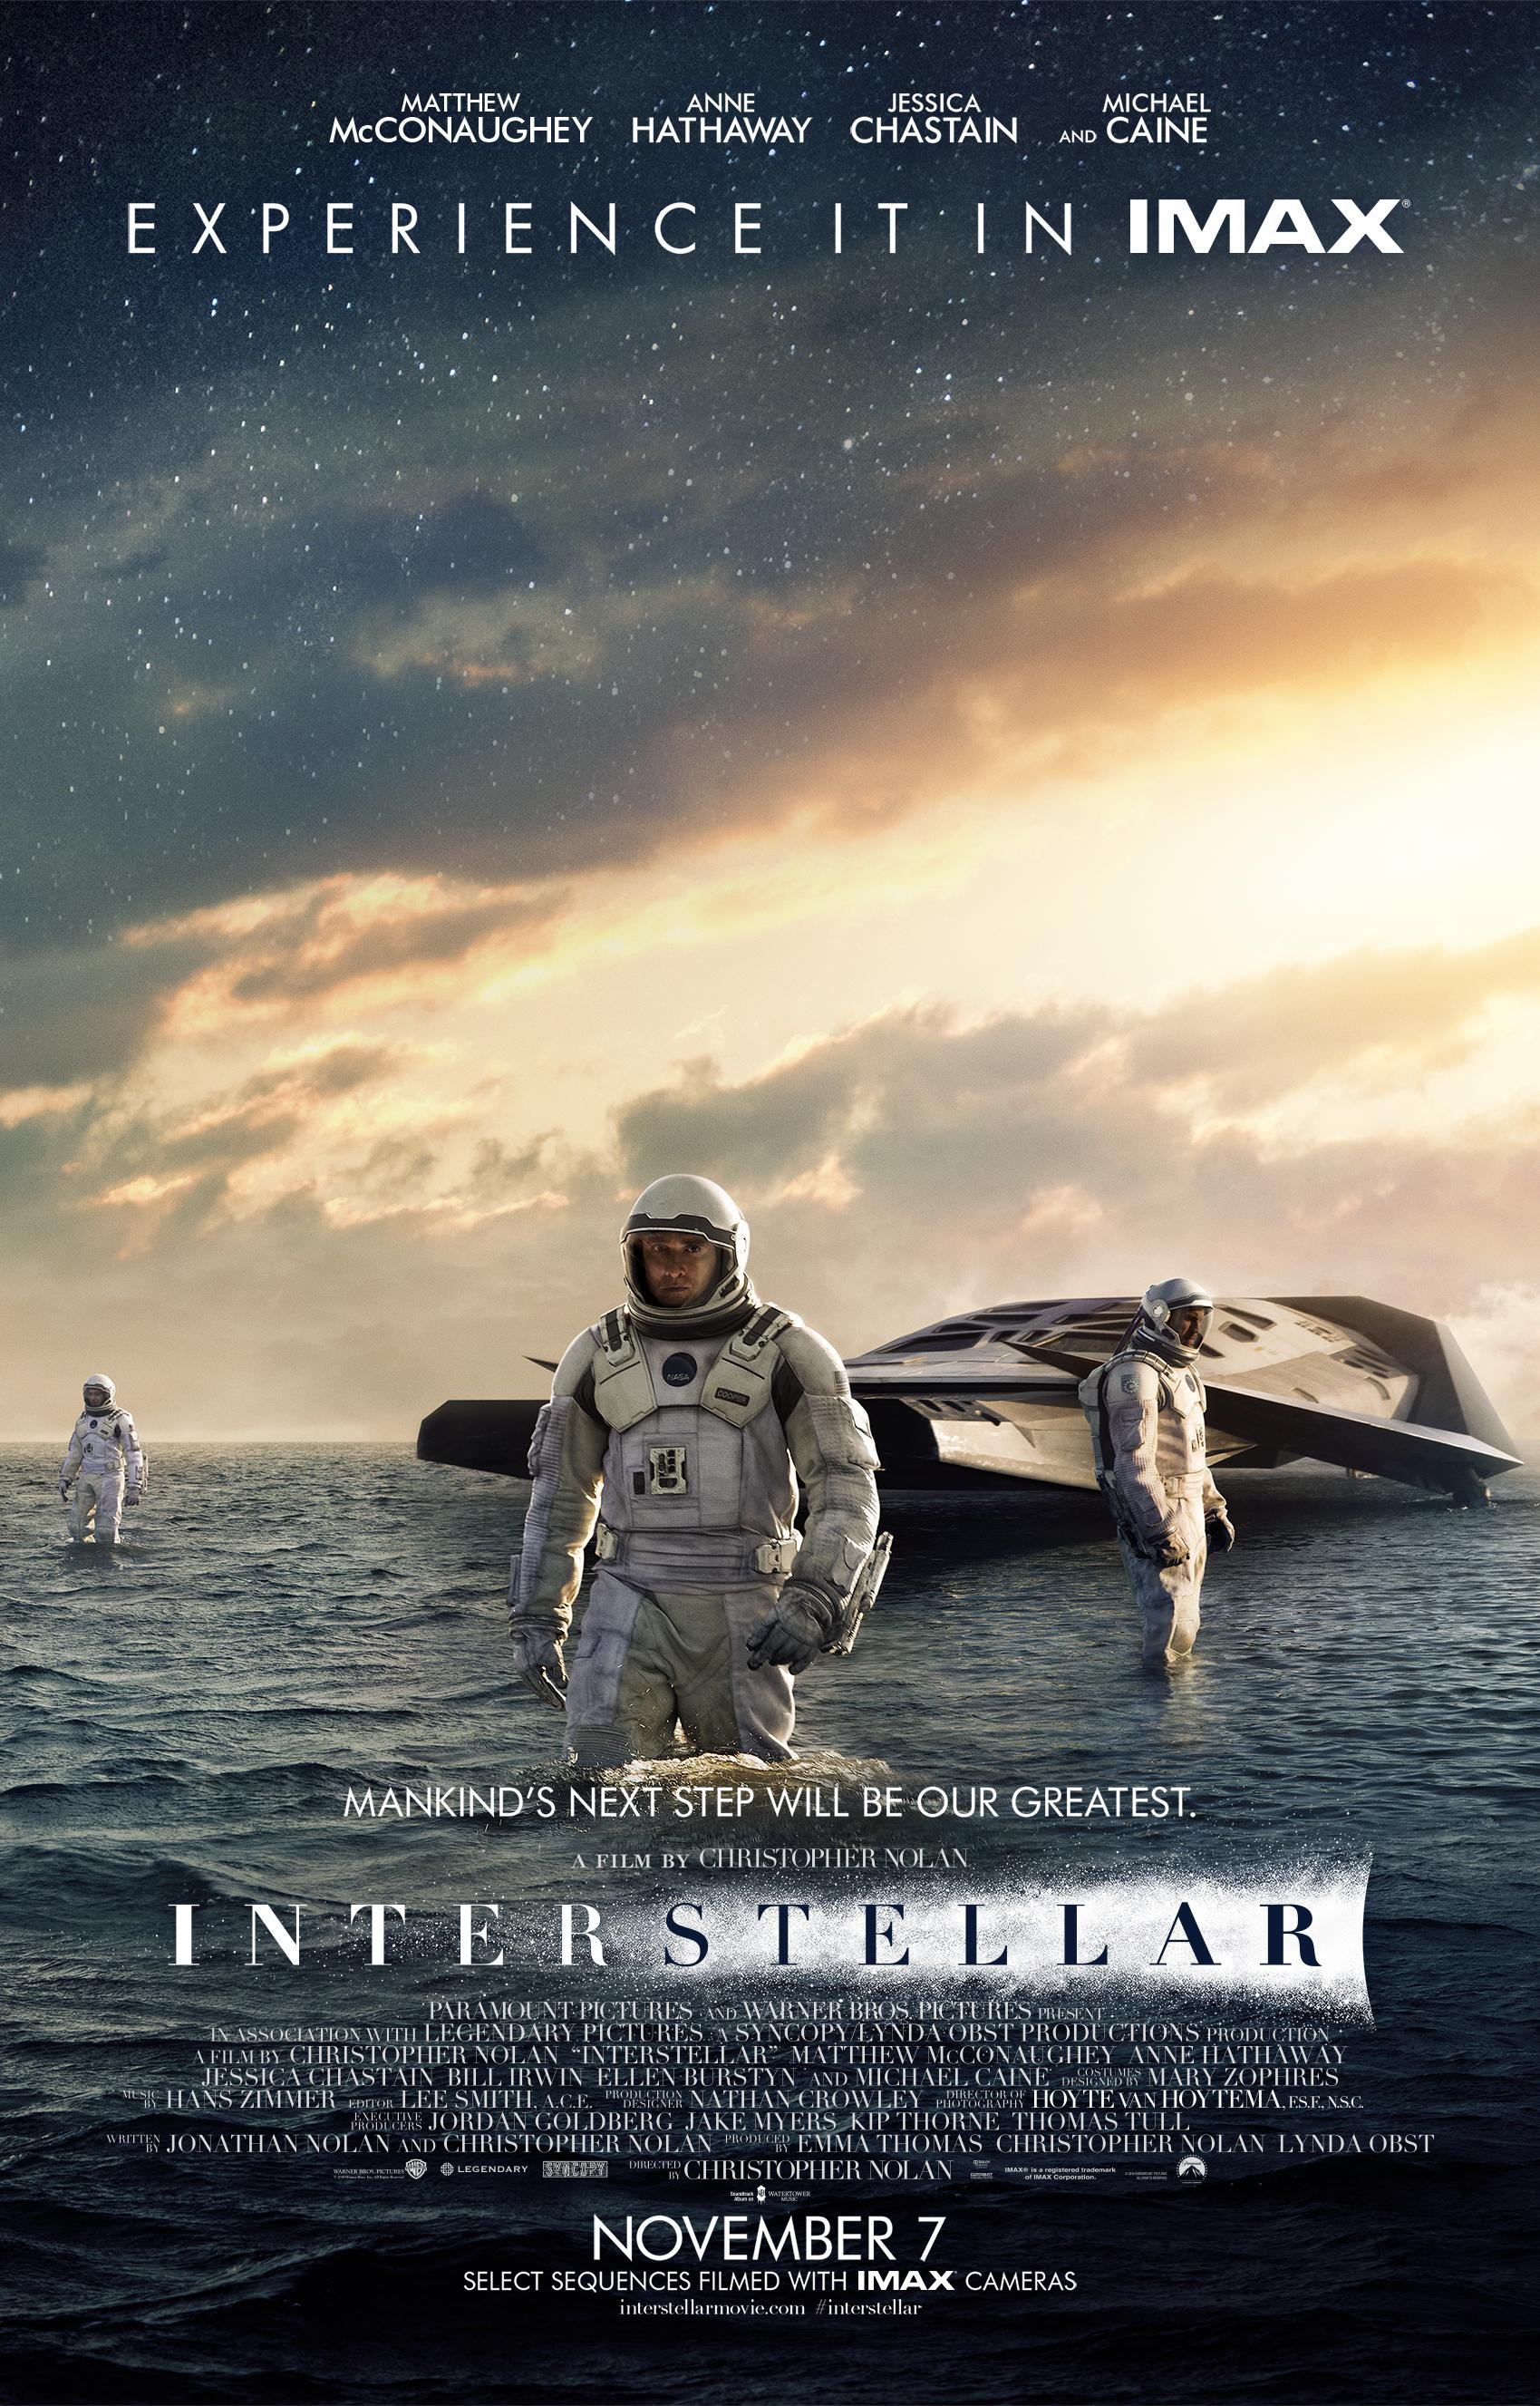 """Interstellar"" theatrical IMAX teaser poster."